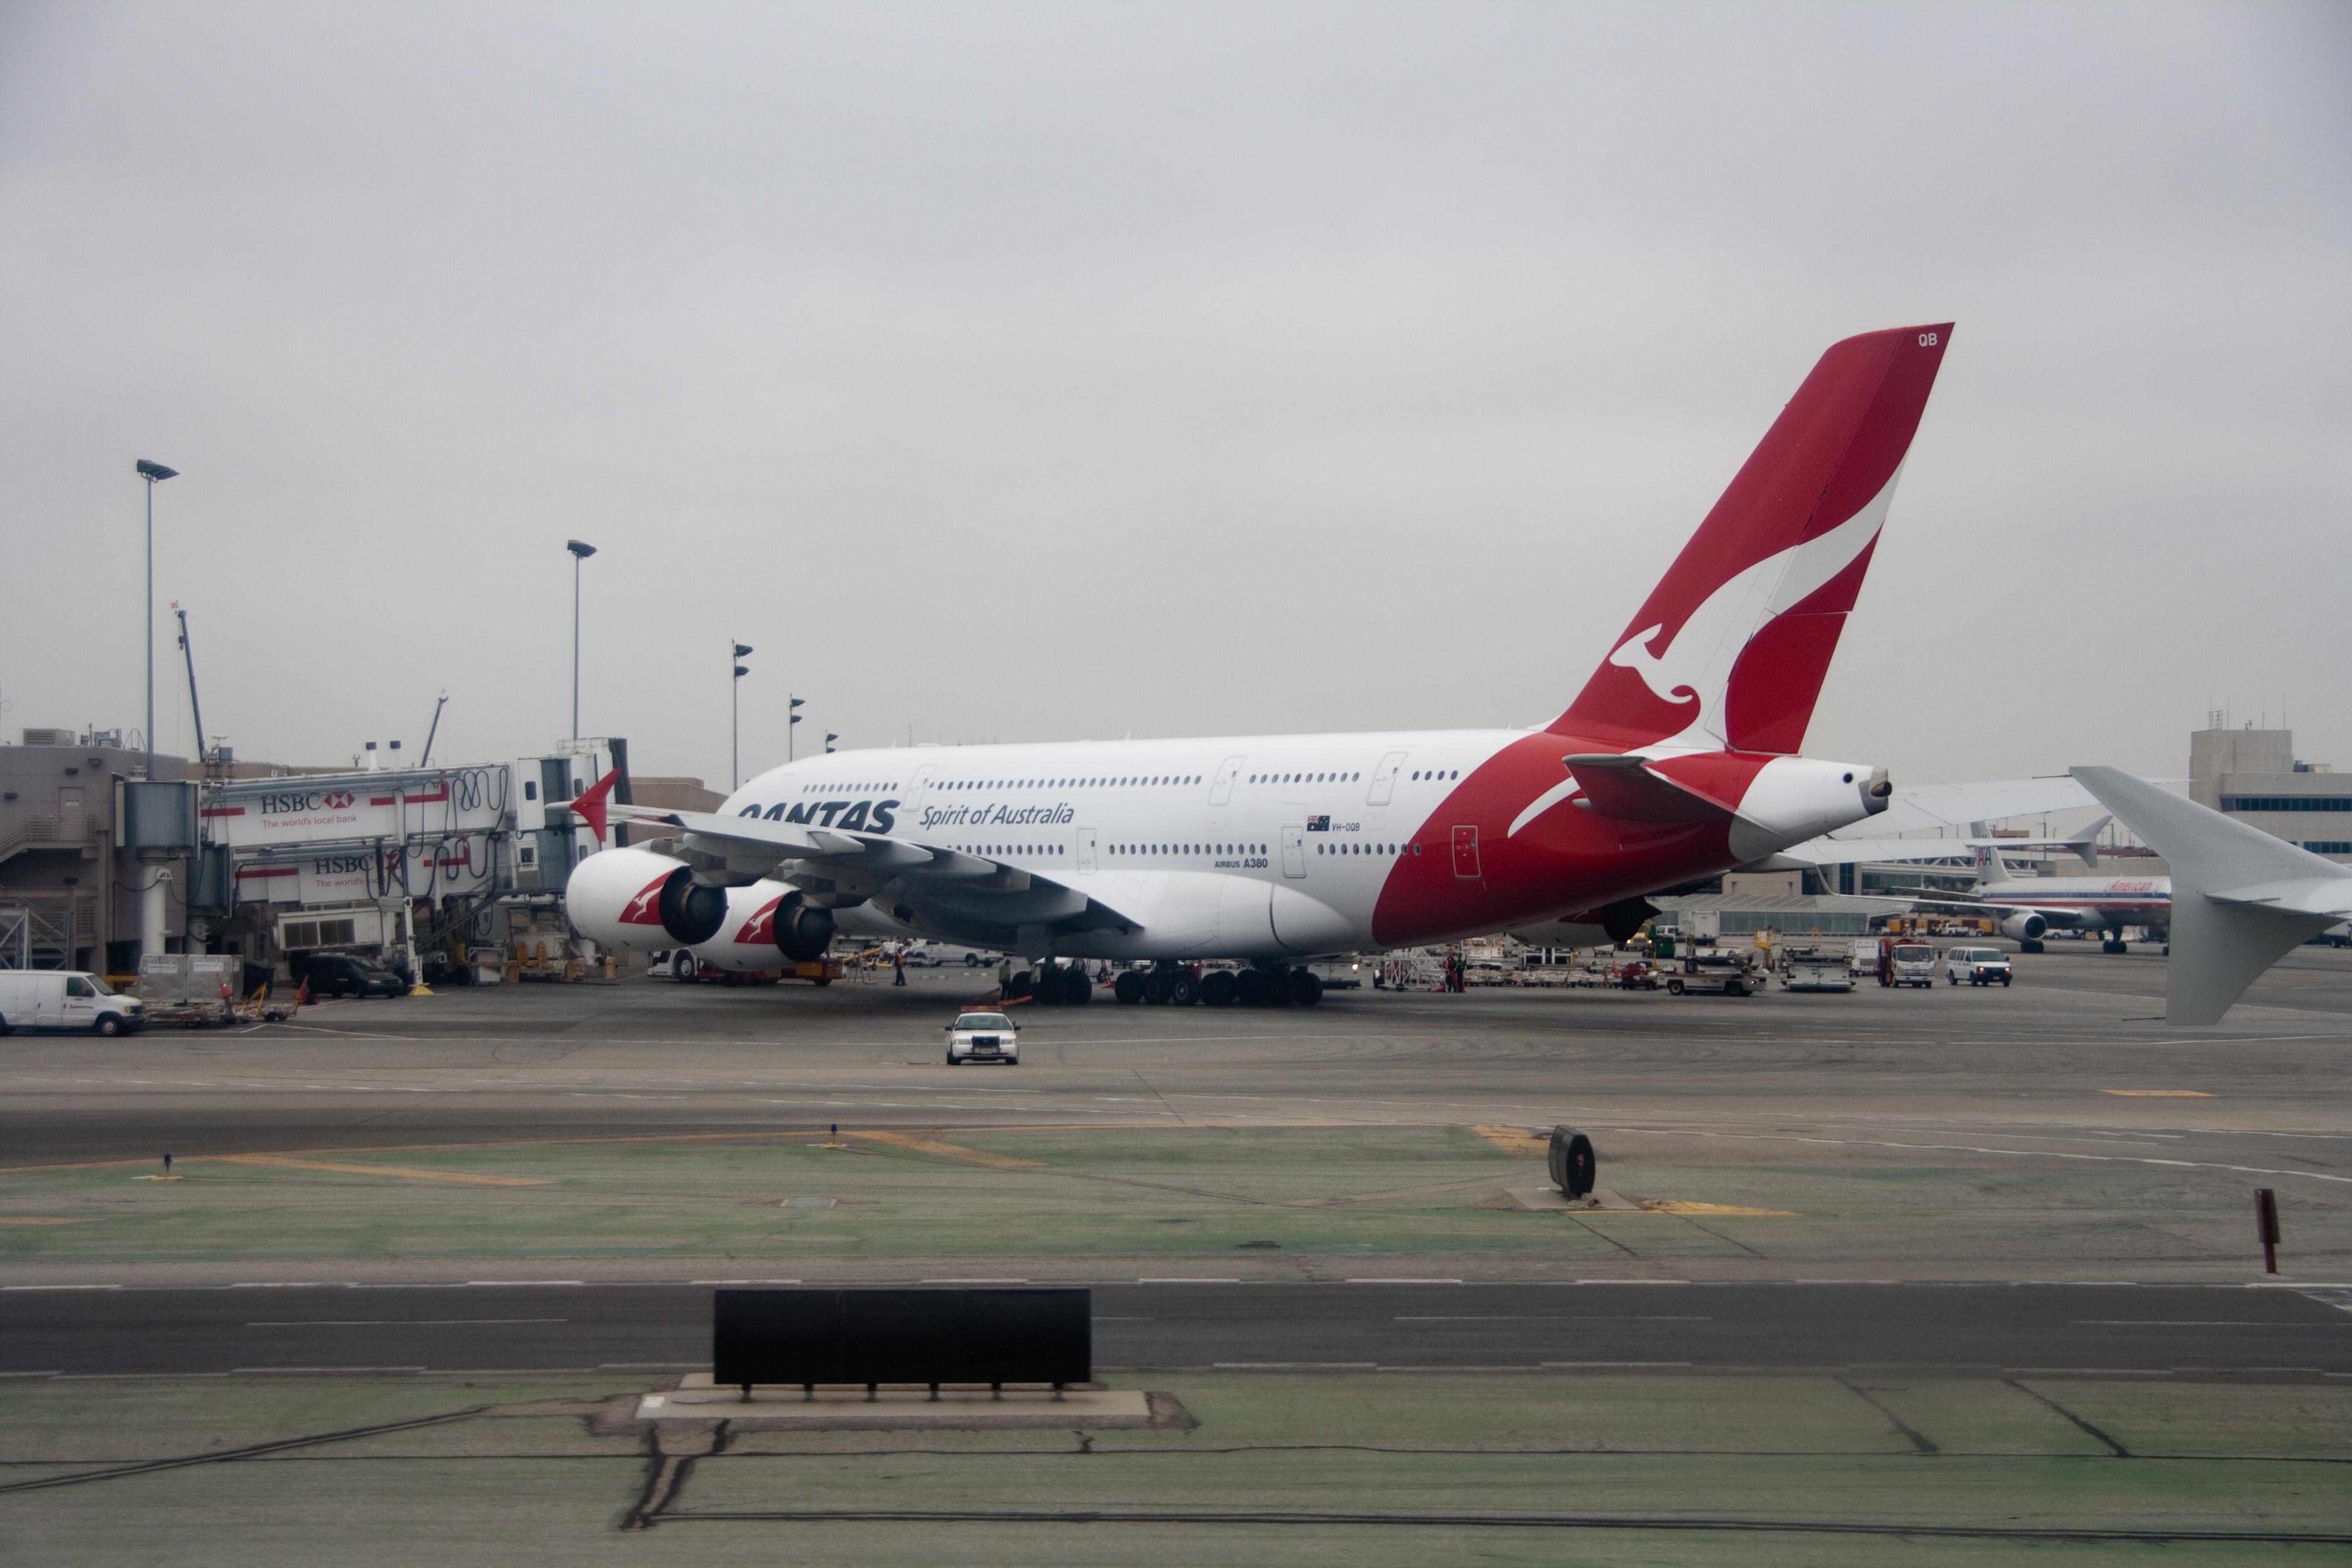 Los Angeles International Airport Hertz Rent A Car